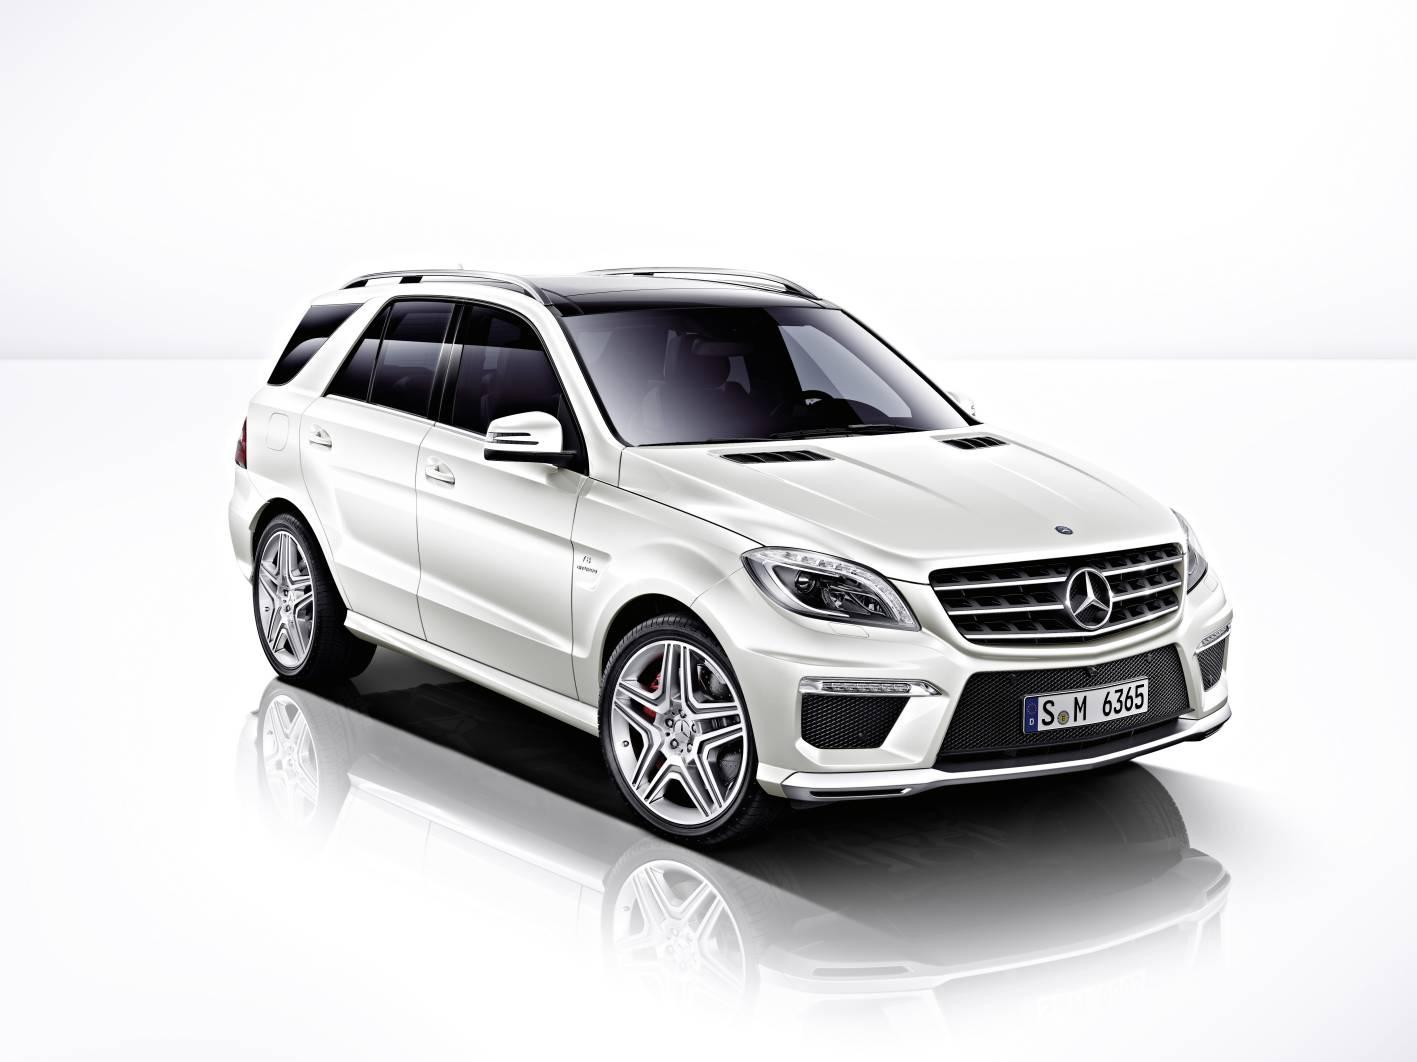 News Mercedes Benz Ml 63 Amg Arrival June 2012